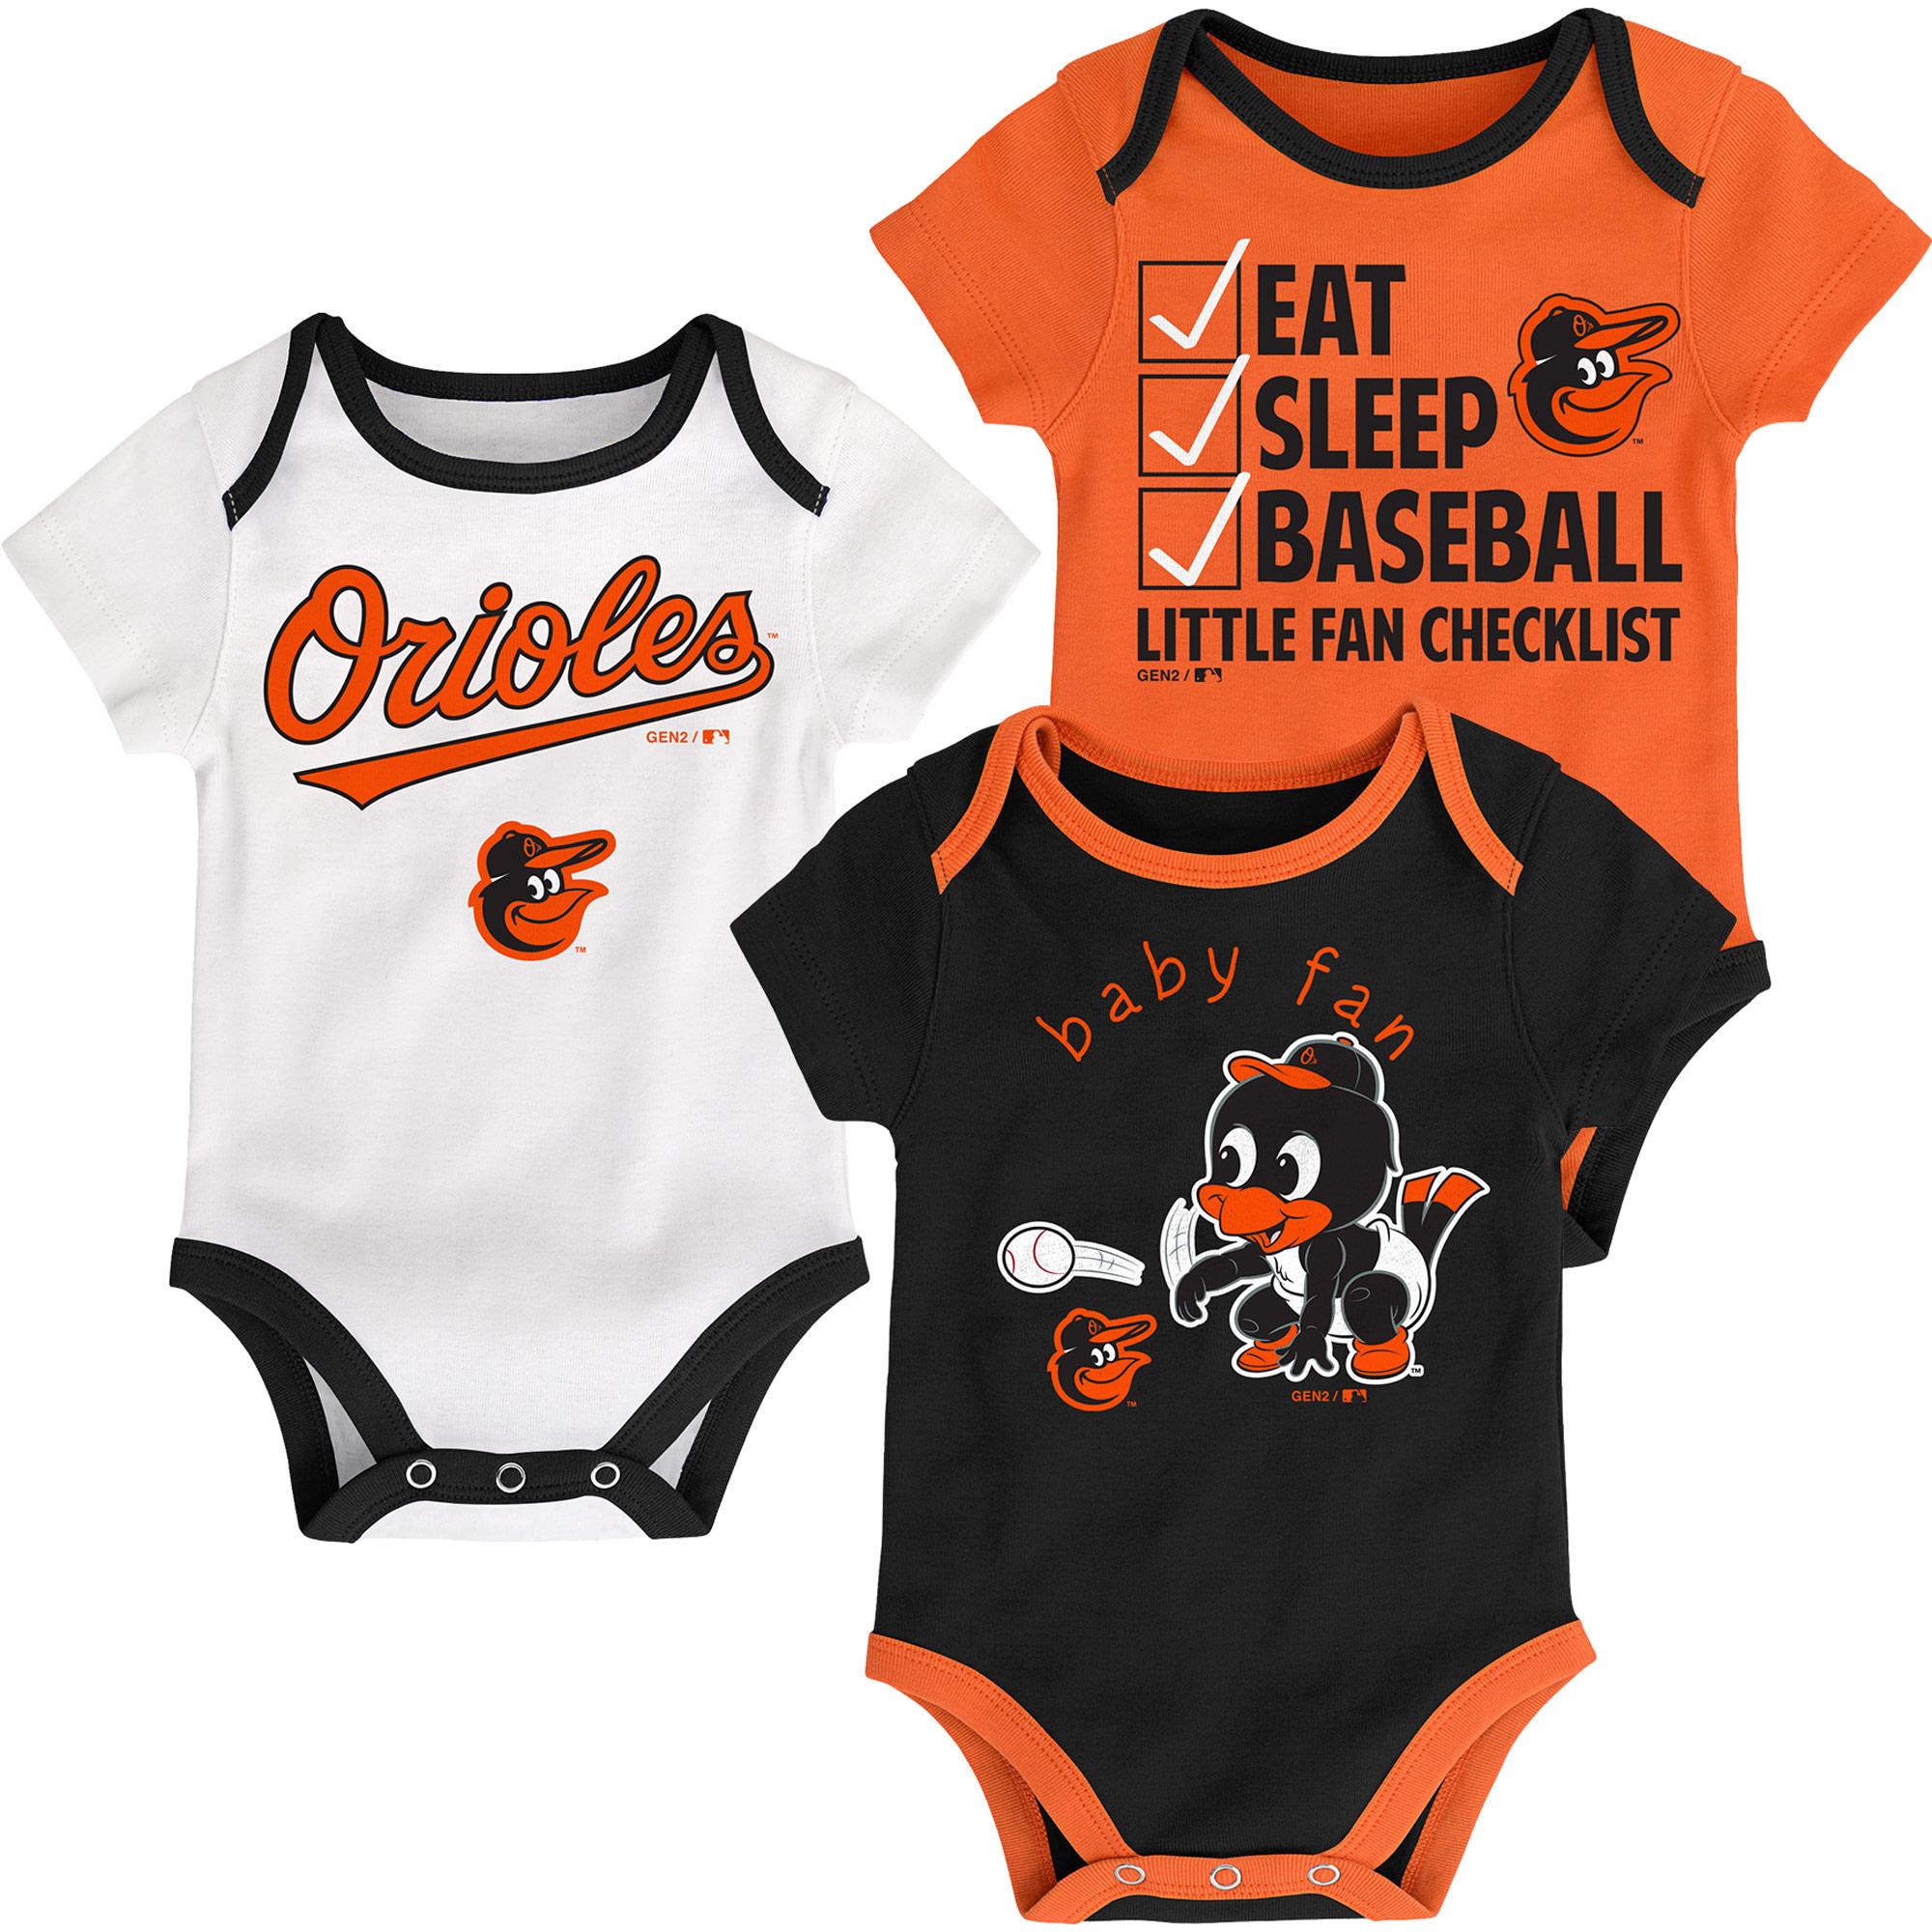 Baltimore Orioles Infant Play Ball Three-Pack Bodysuit Set - Black/Orange/White